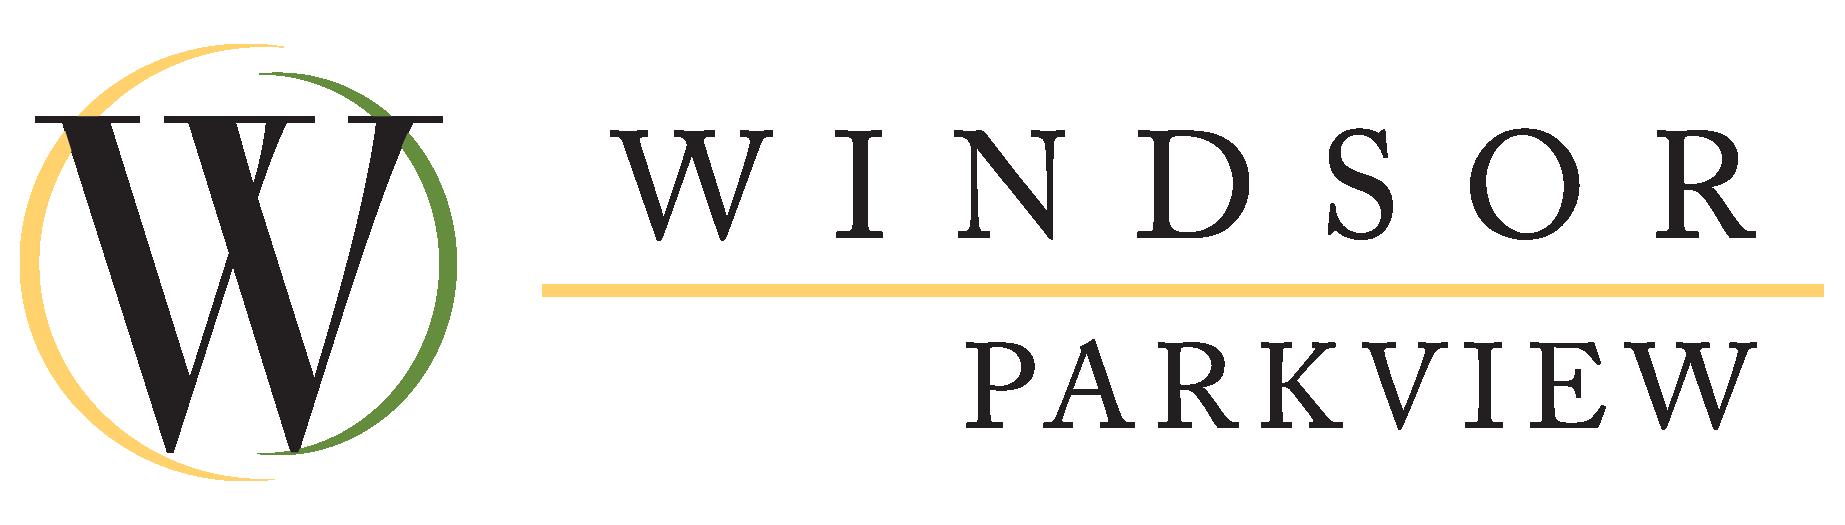 Windsor Parkview